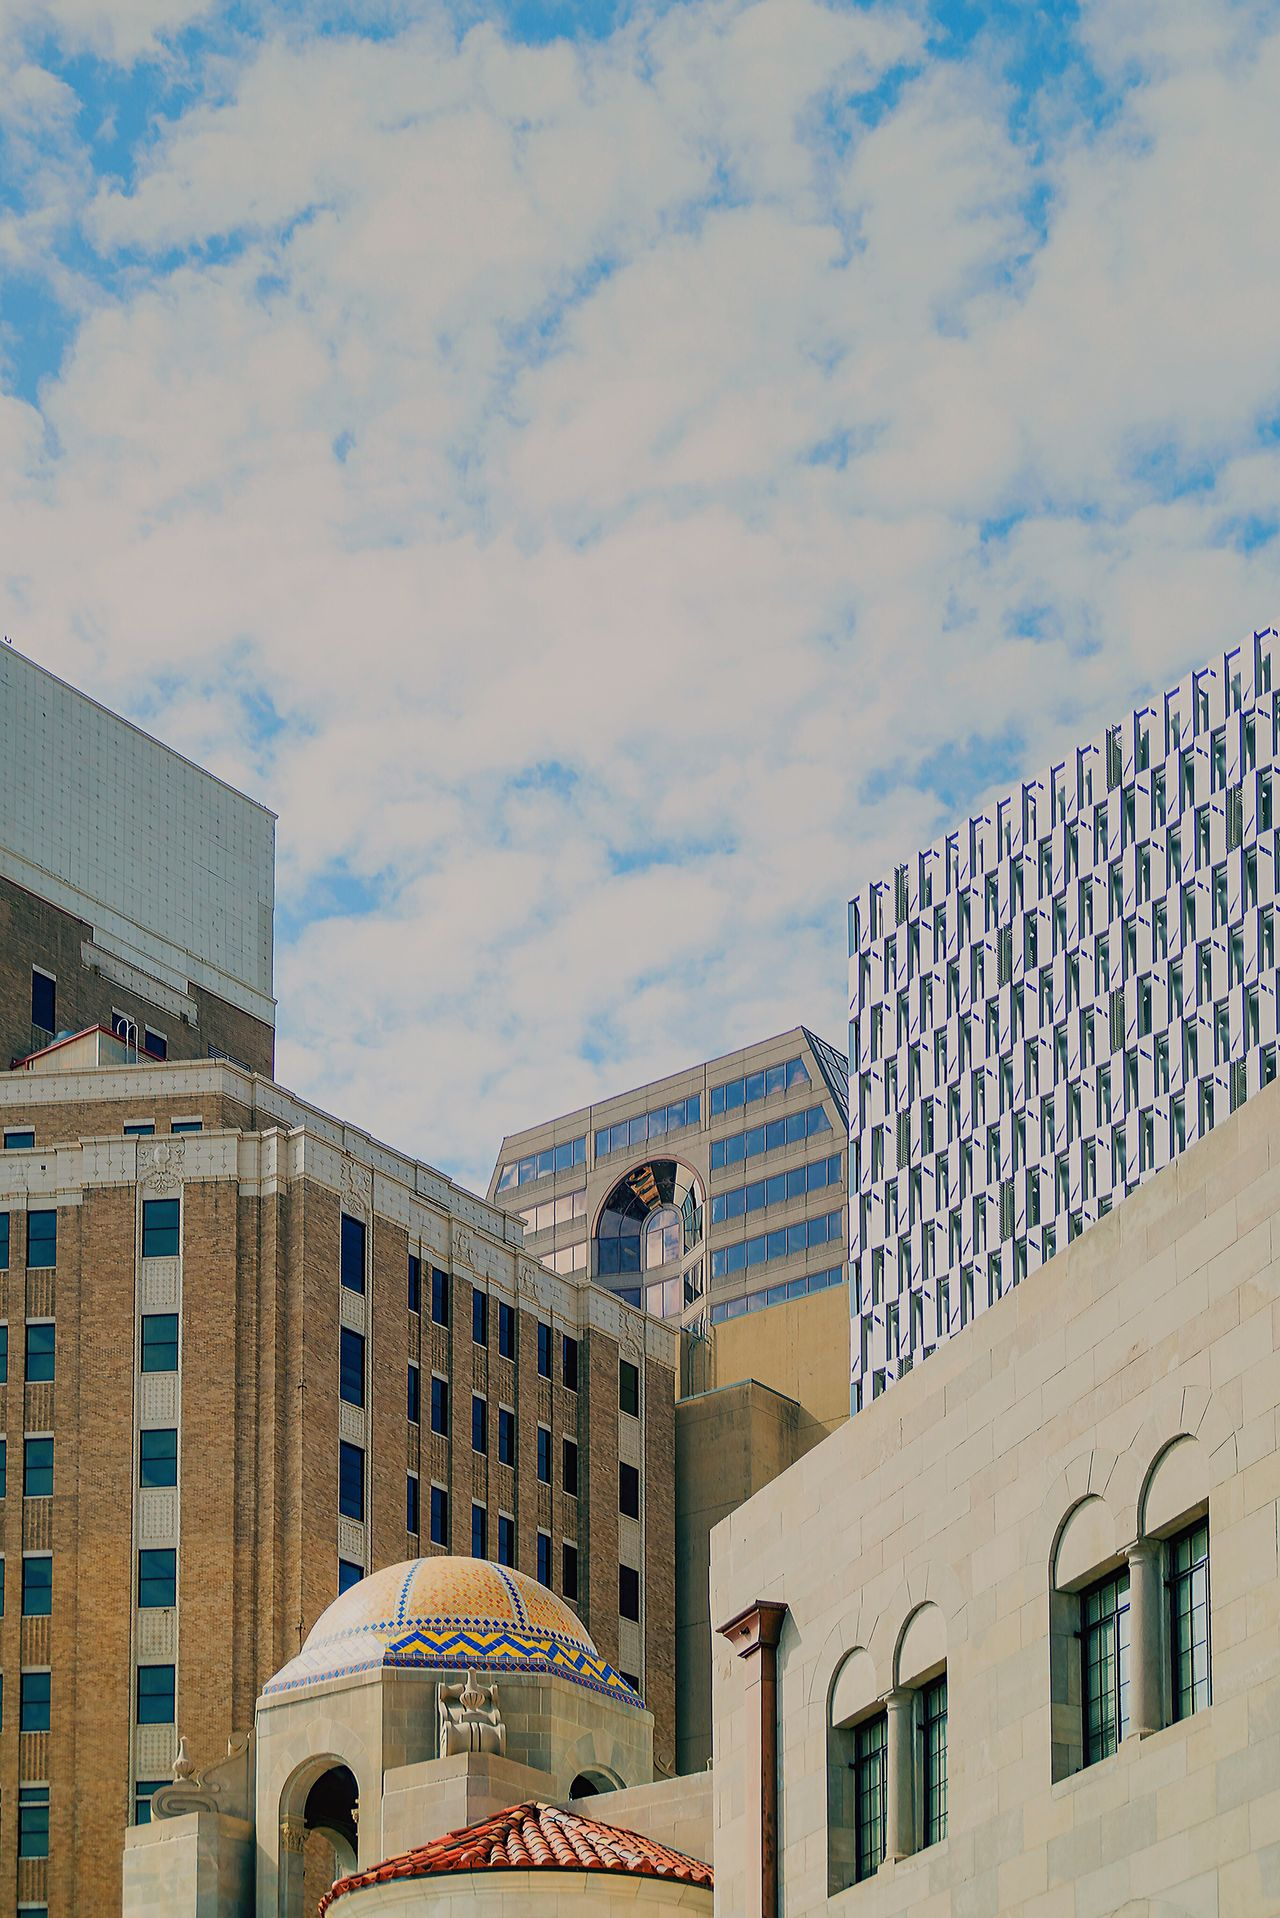 Urban Geometry Architecture The Architect - 2016 EyeEm Awards Fine Art Photography San Antonio, Texas EyeEmGalley